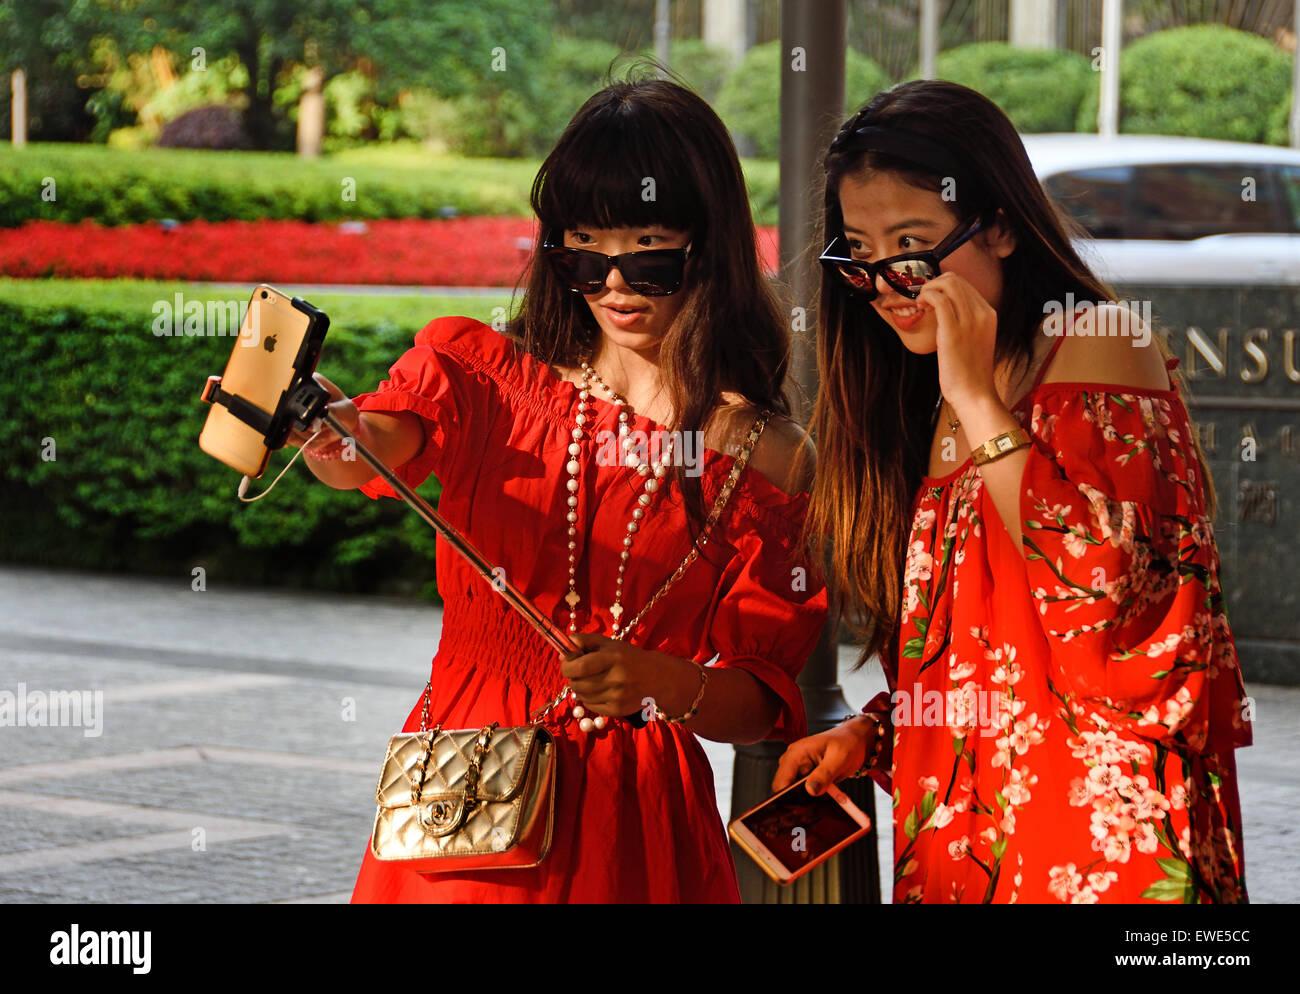 selfie stick photo attractive beautiful young  women Shanghai China Chinese - Stock Image